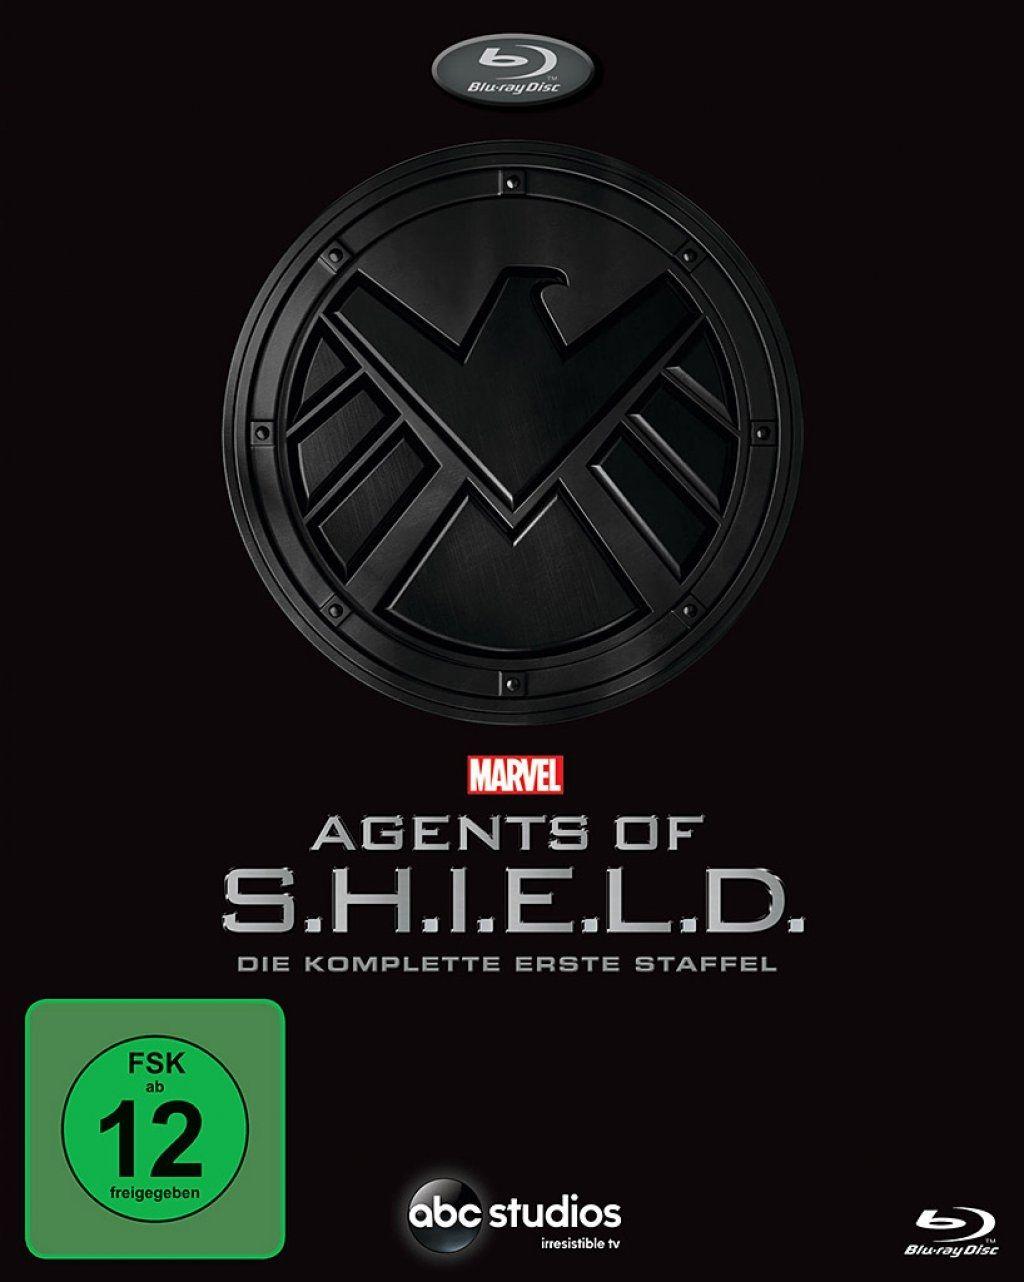 Marvel's Agents of S.H.I.E.L.D. - Die komplette erste Staffel (5 Discs) (BLURAY)